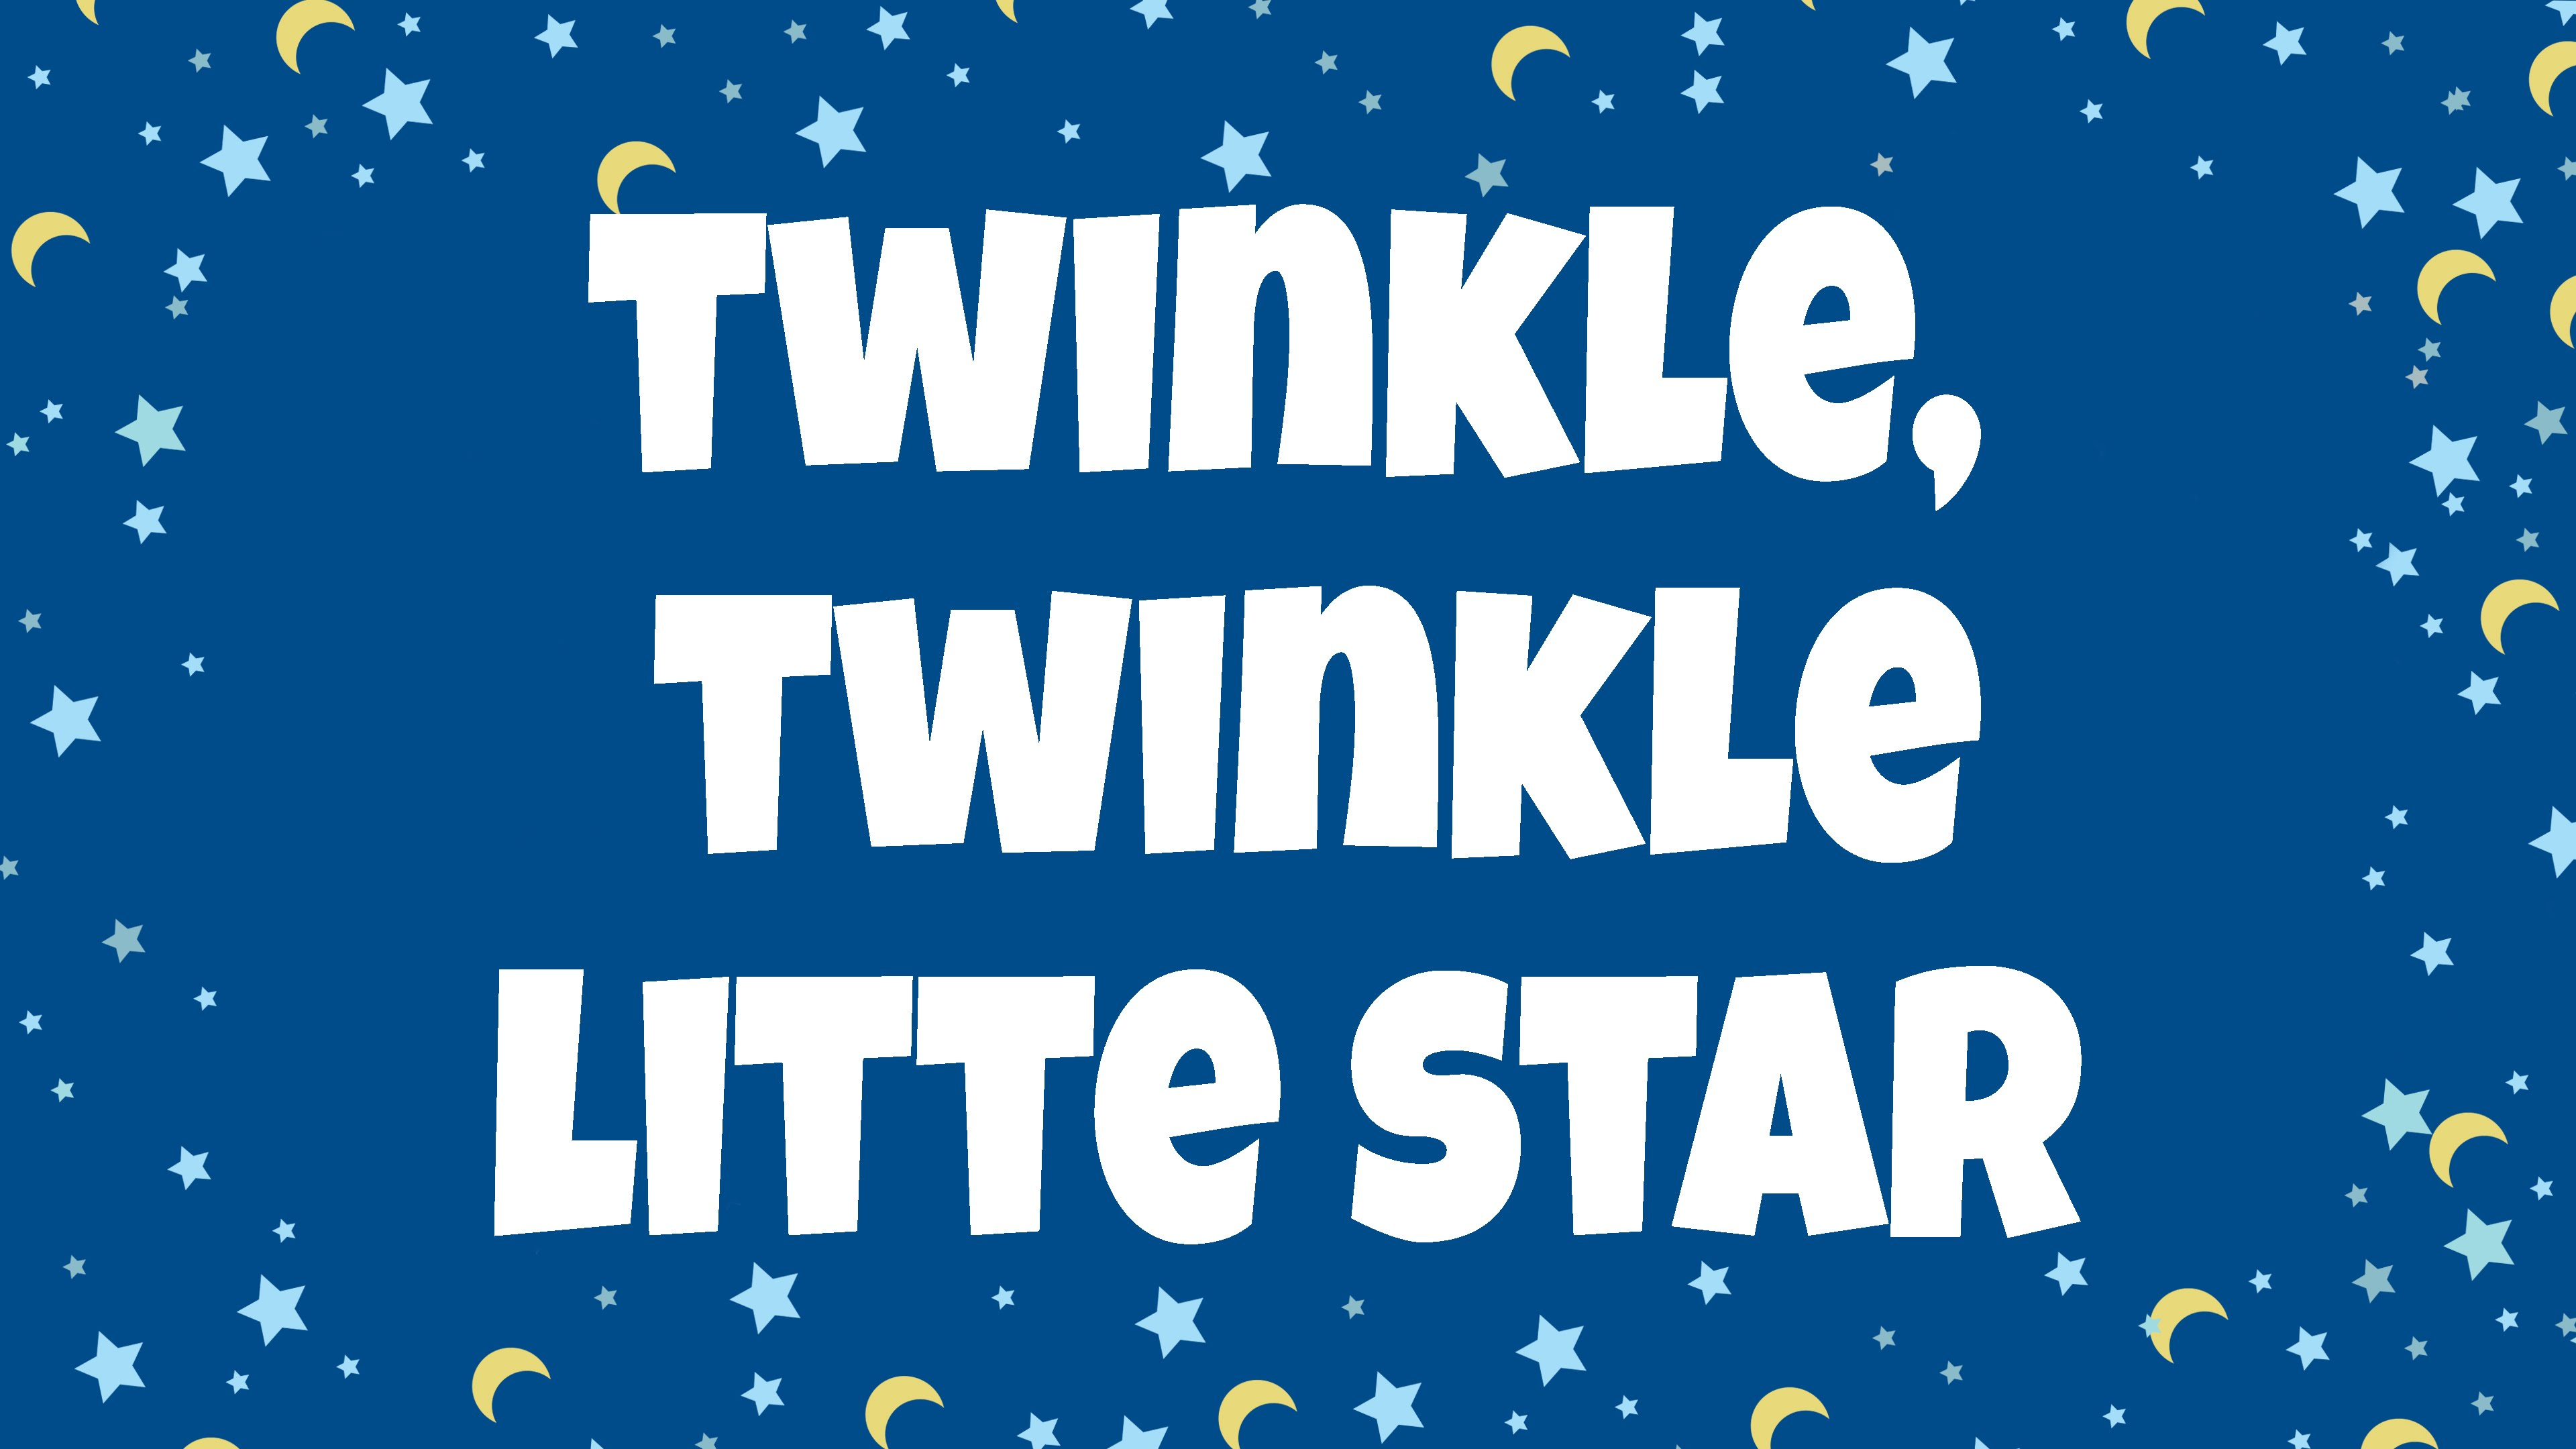 Twinkle Twinkle Little Star Lyrics | Nursery Rhymes | Children Love to Sing